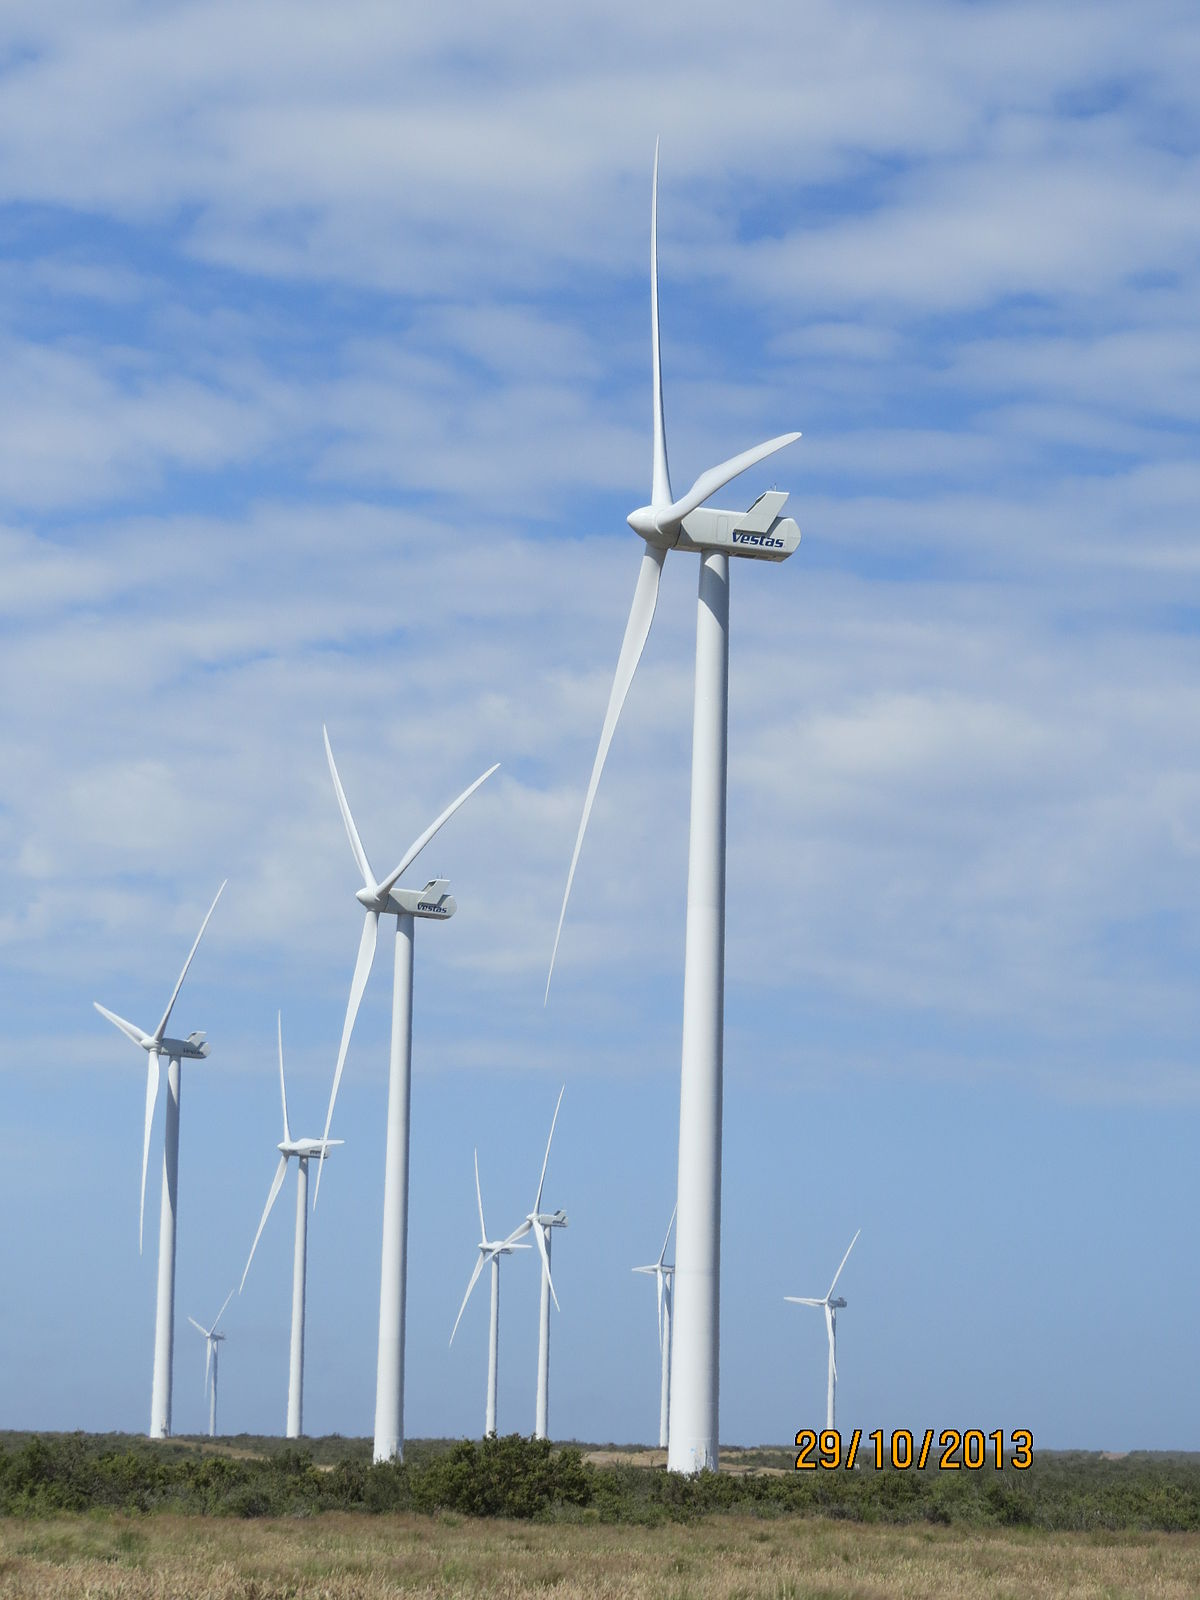 Energía eólica en Argentina - Wikipedia, la enciclopedia libre